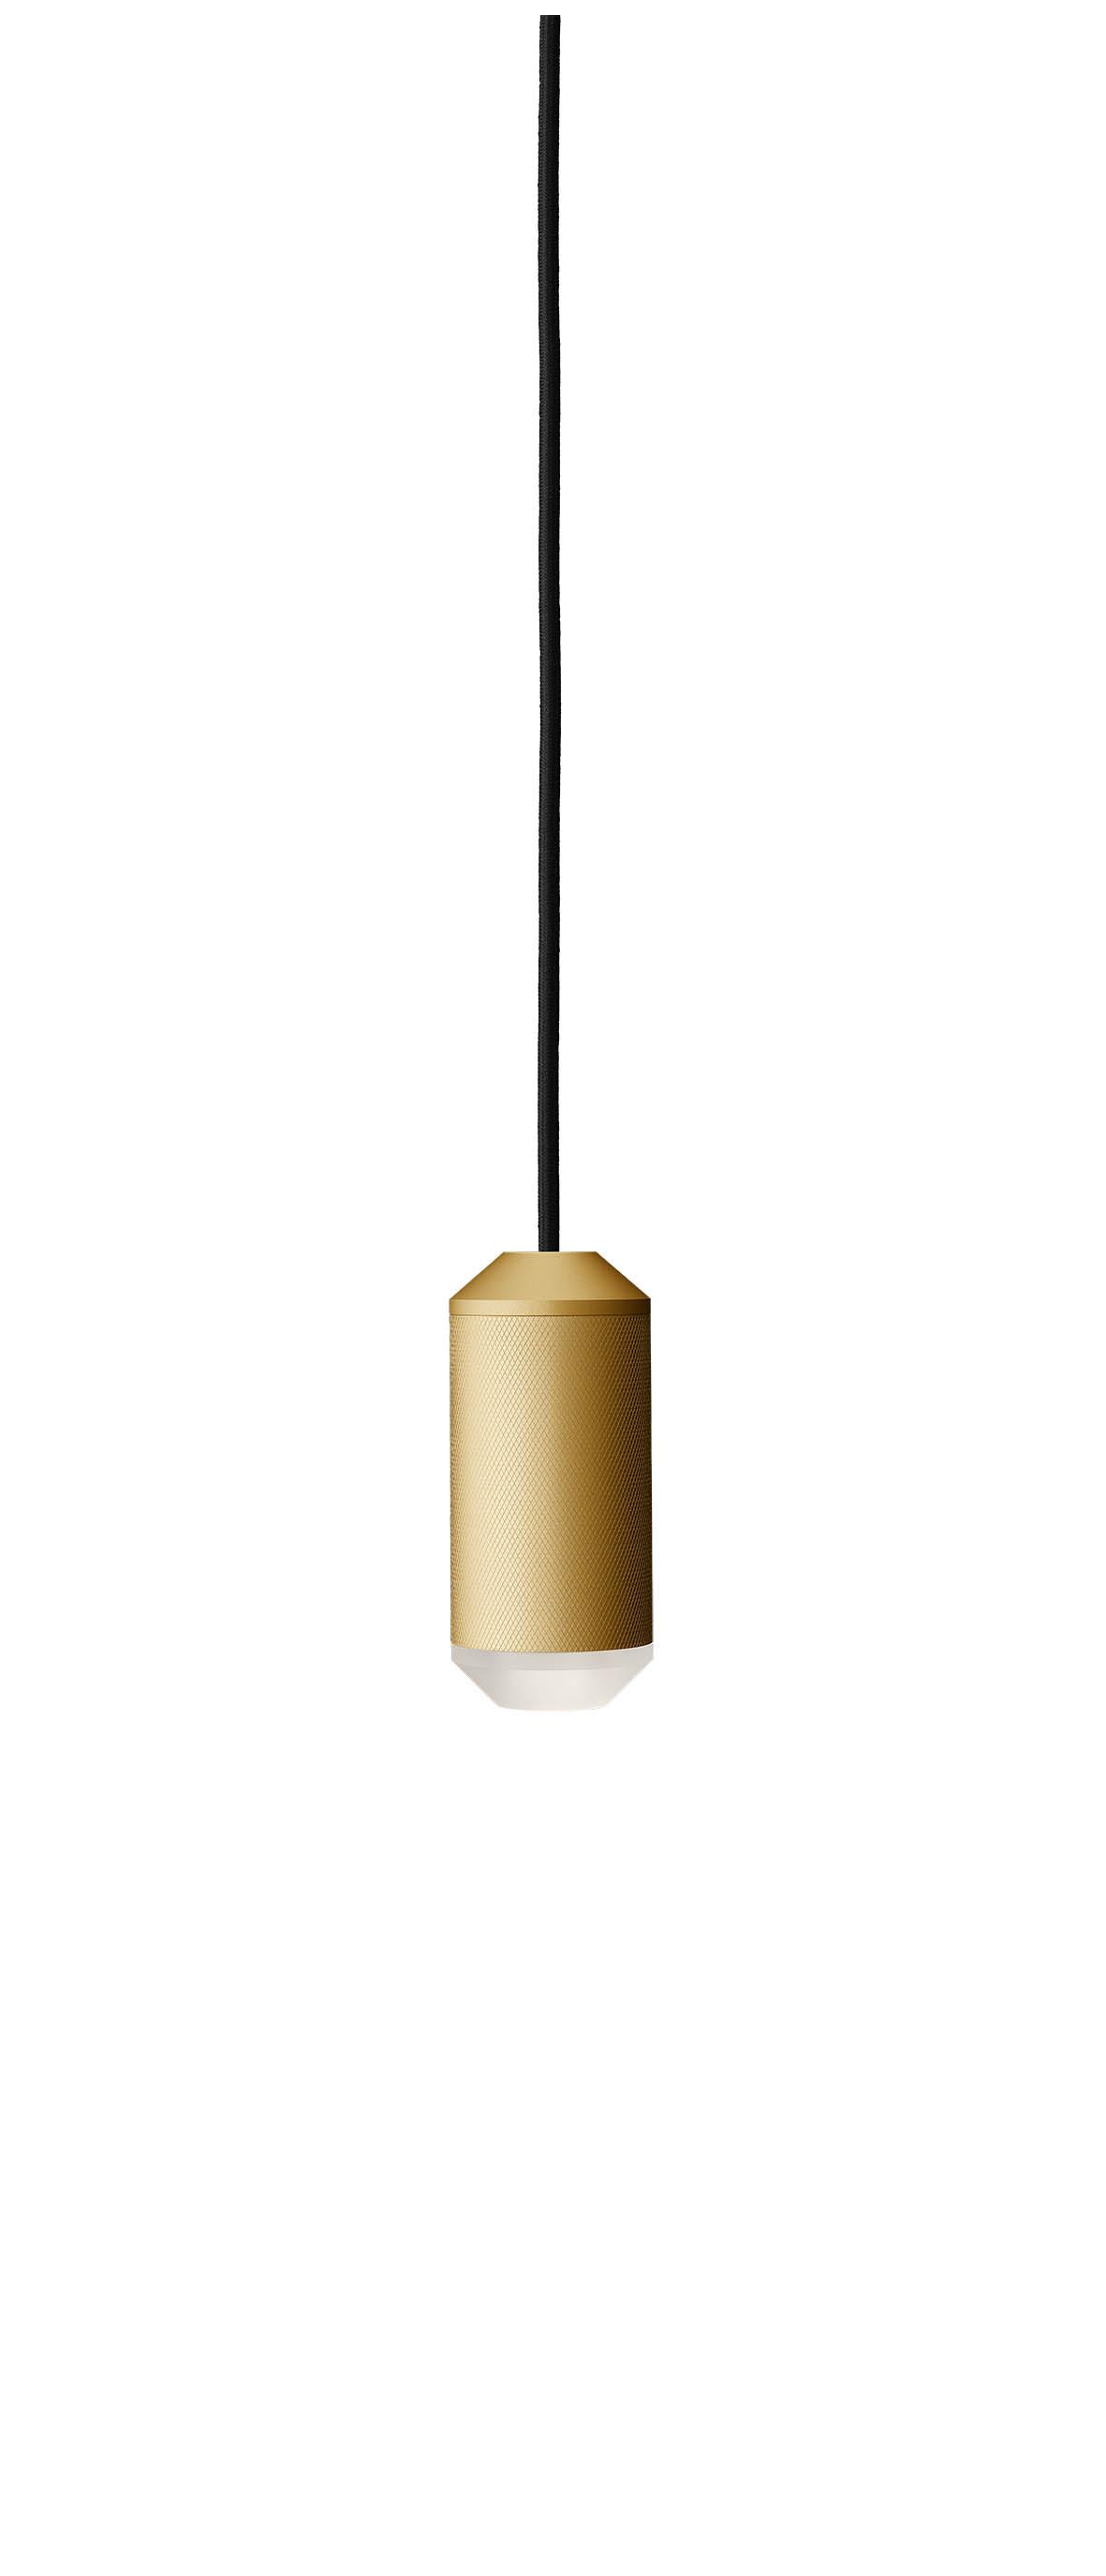 Lustra Backbeat / Acrylic bottom, Oslash;6,5 cm, H14,5 cm, Gold